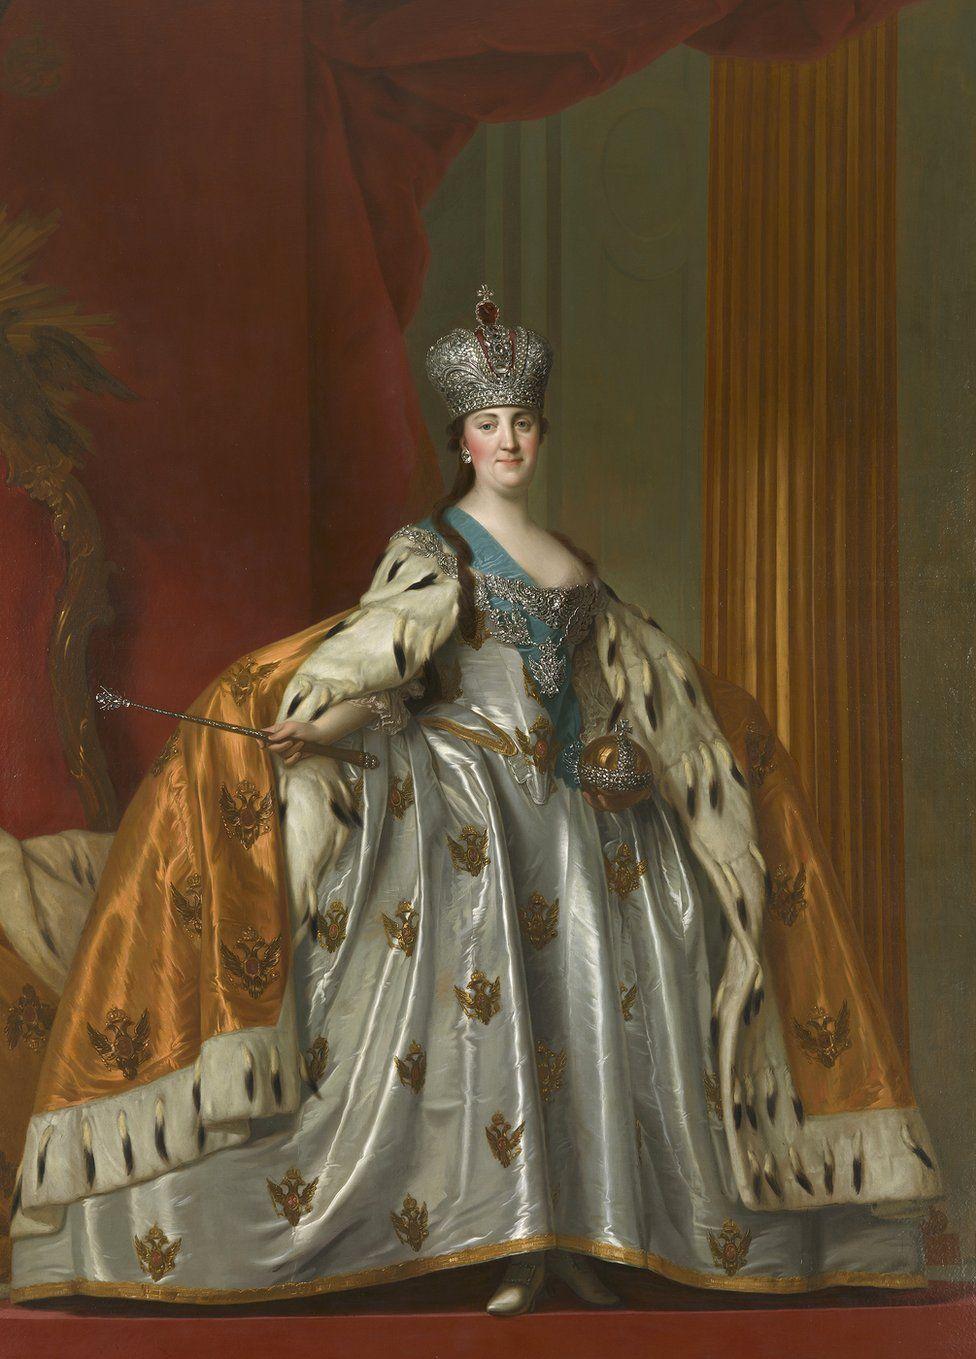 Russia - Royalty & the Romanovs